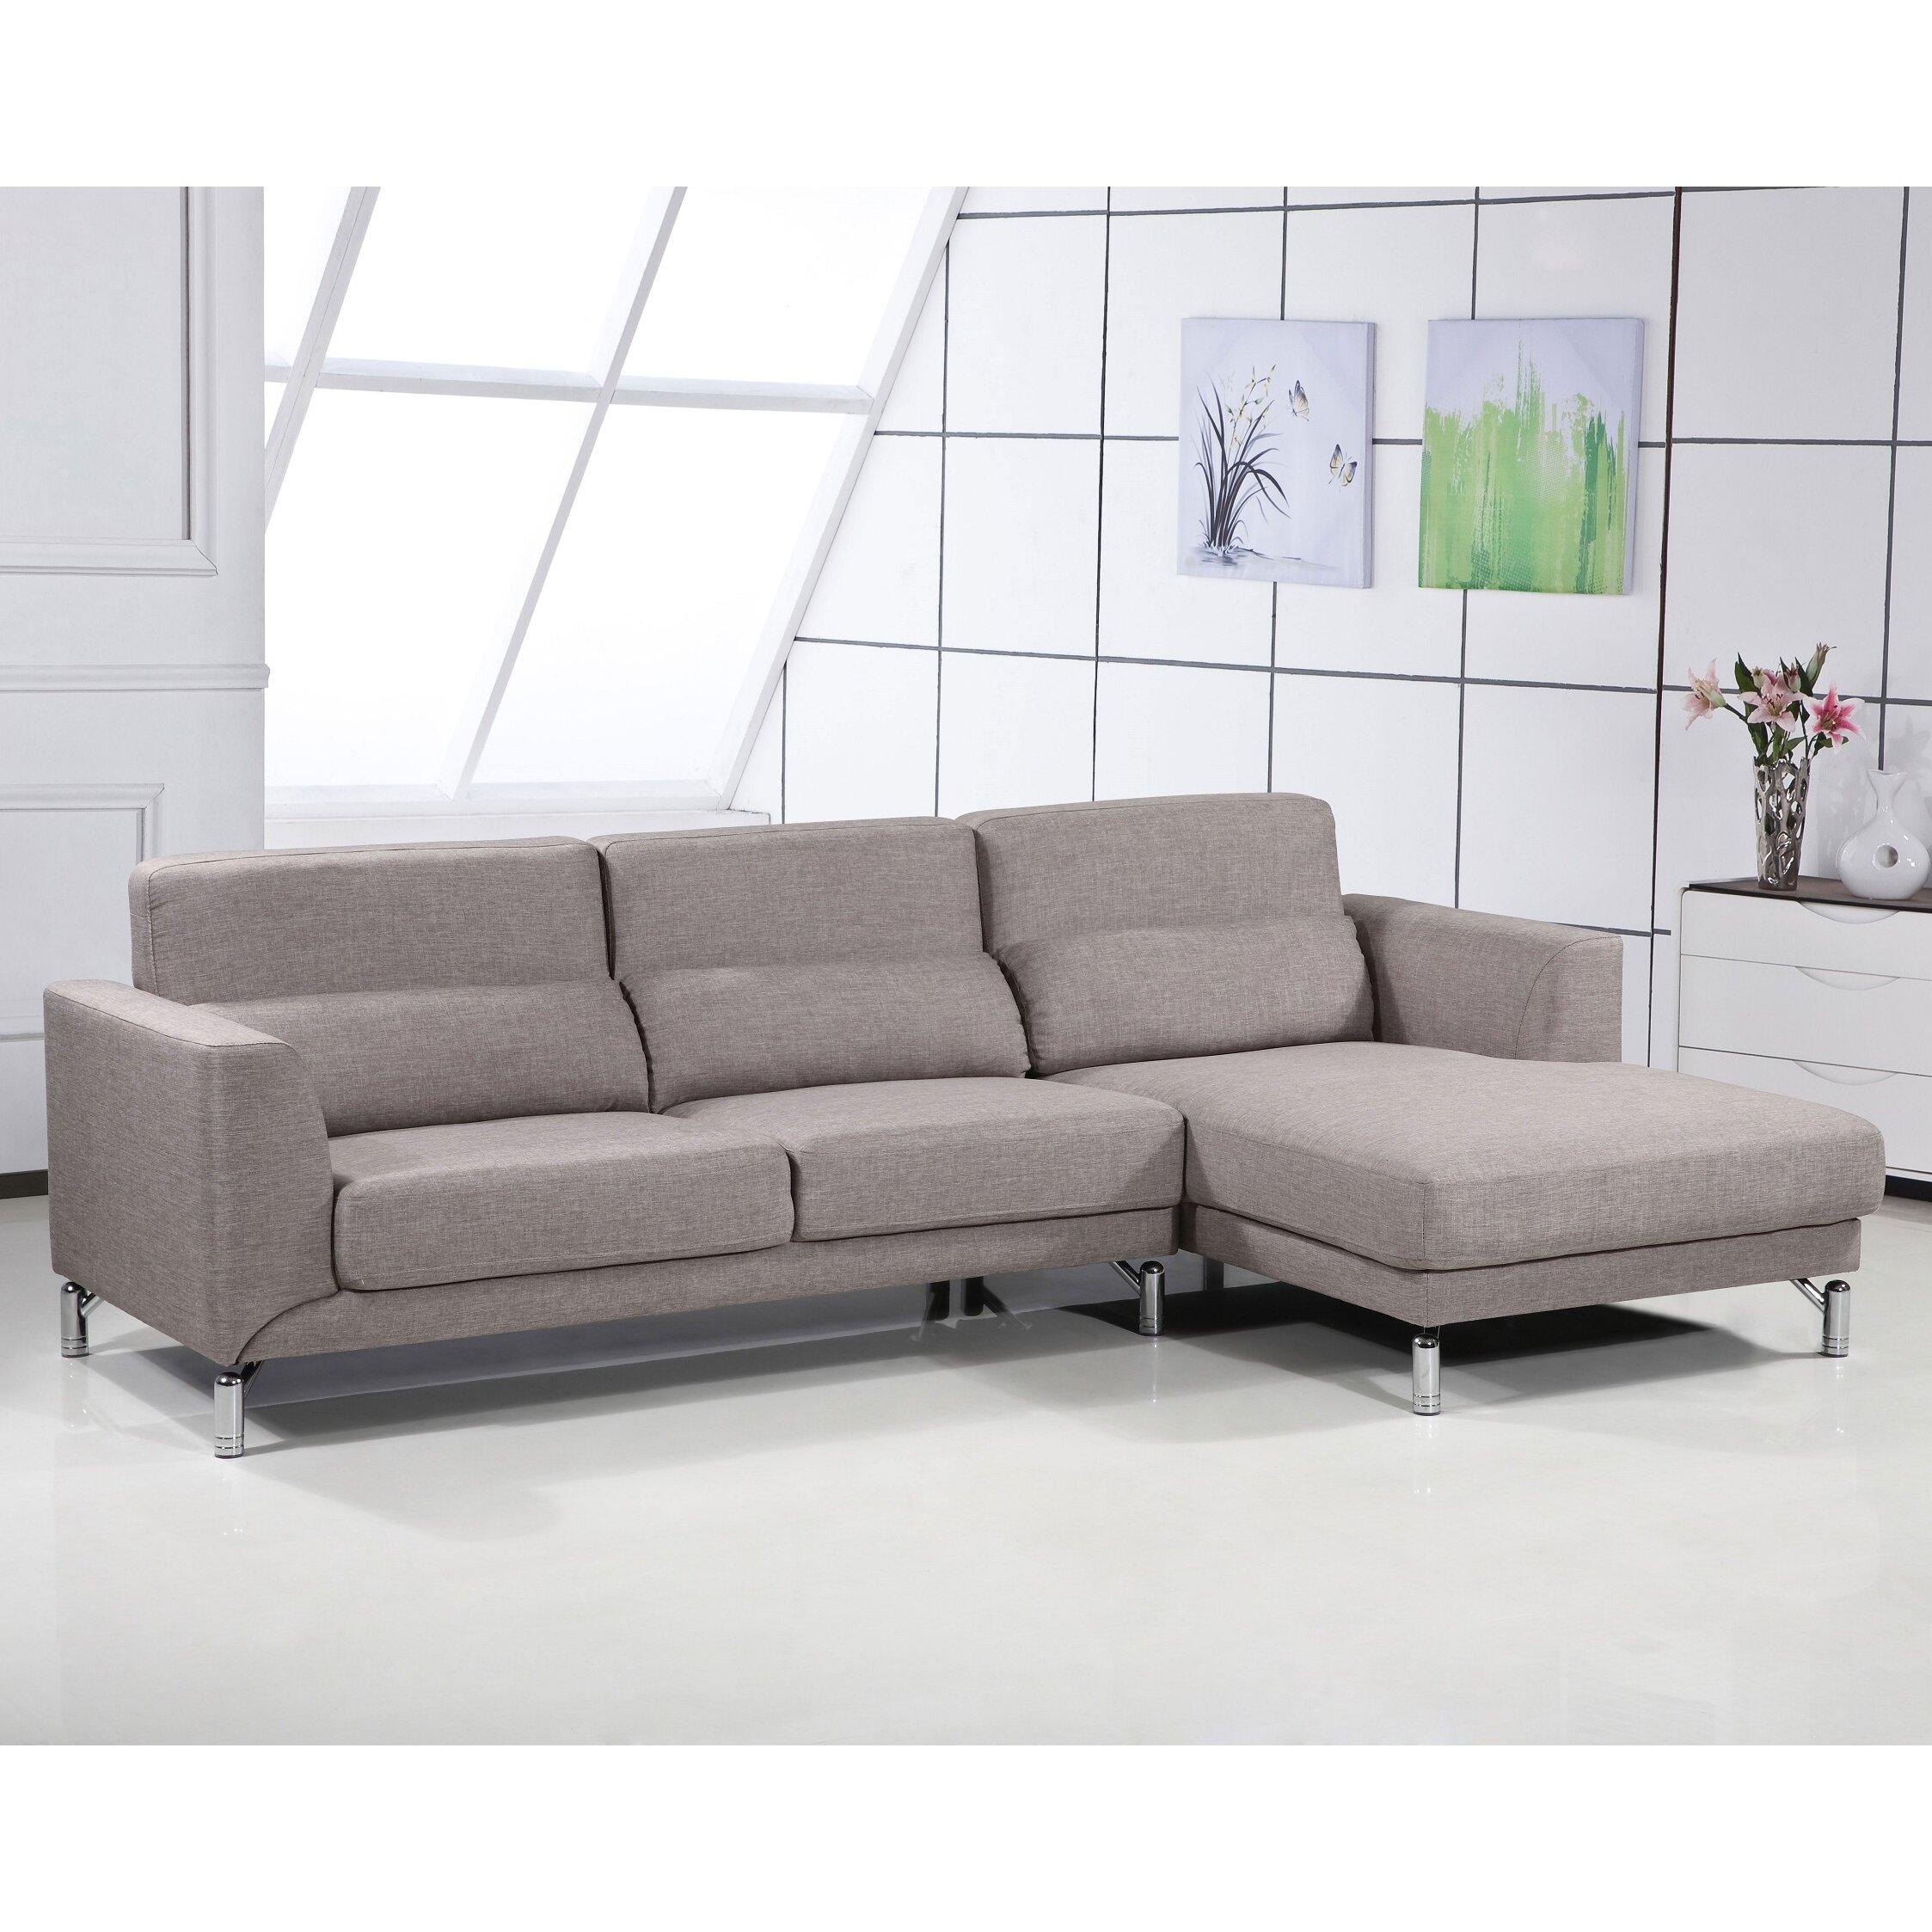 Aria Fabric Modern Sectional Sofa Set CNTA